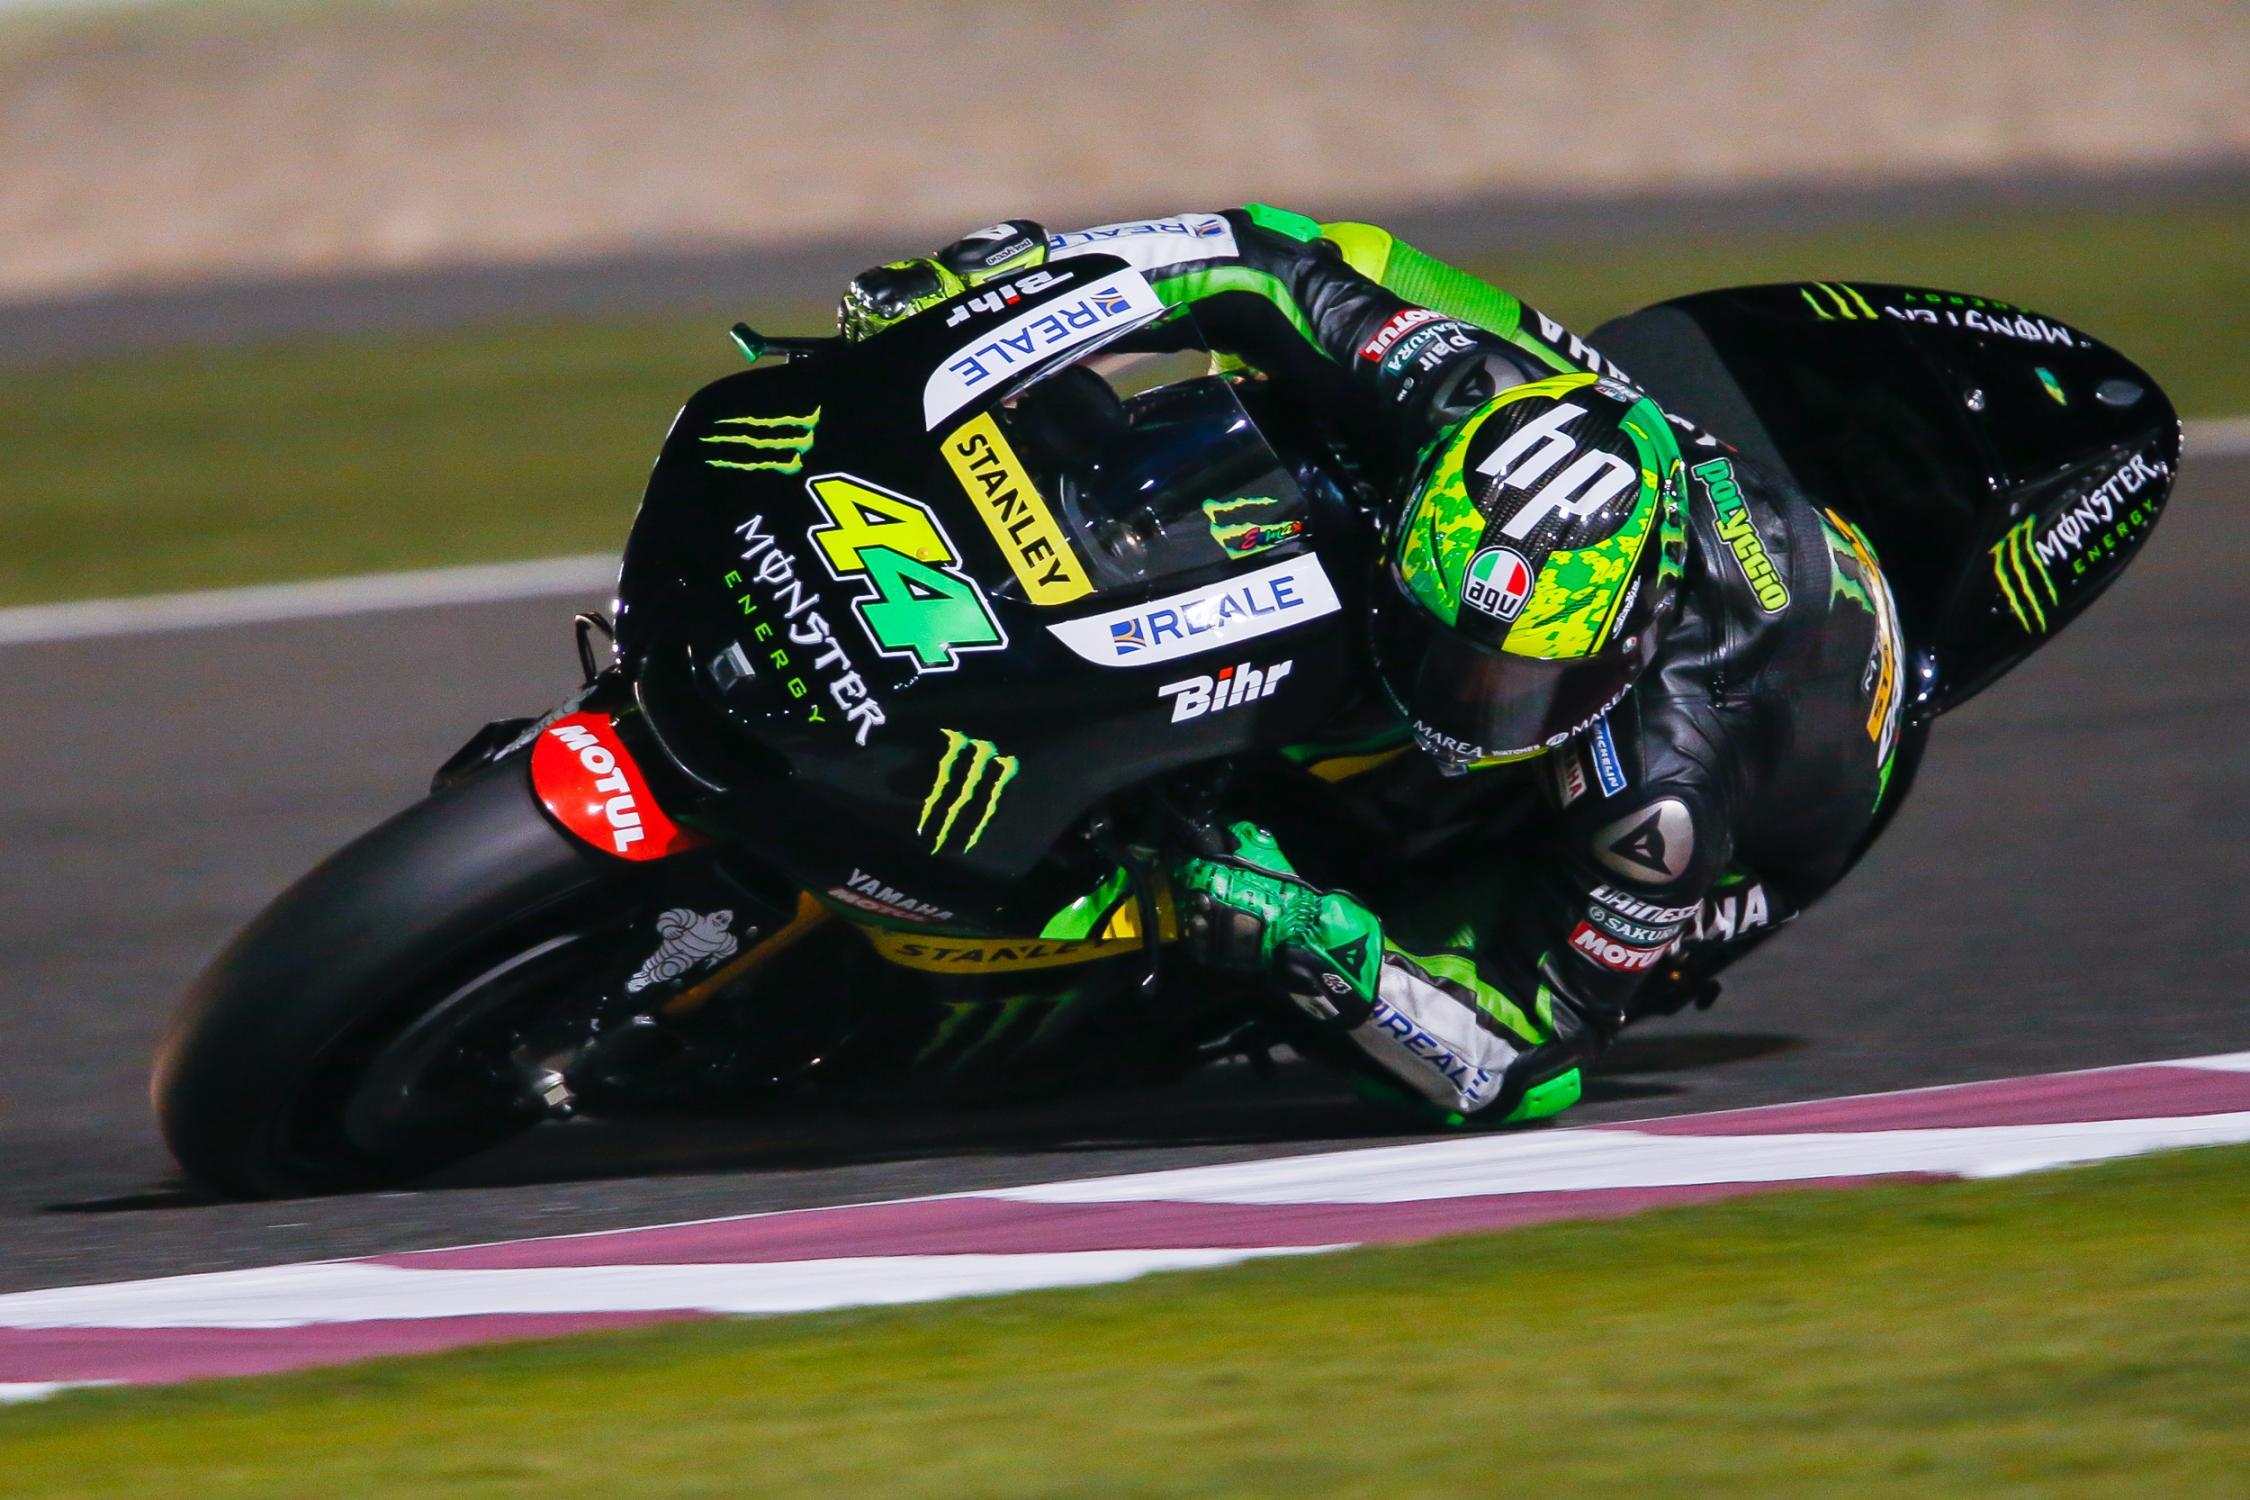 Test MotoGP Qatar 2016 44-espargaro_gp_7470_0.gallery_full_top_fullscreen